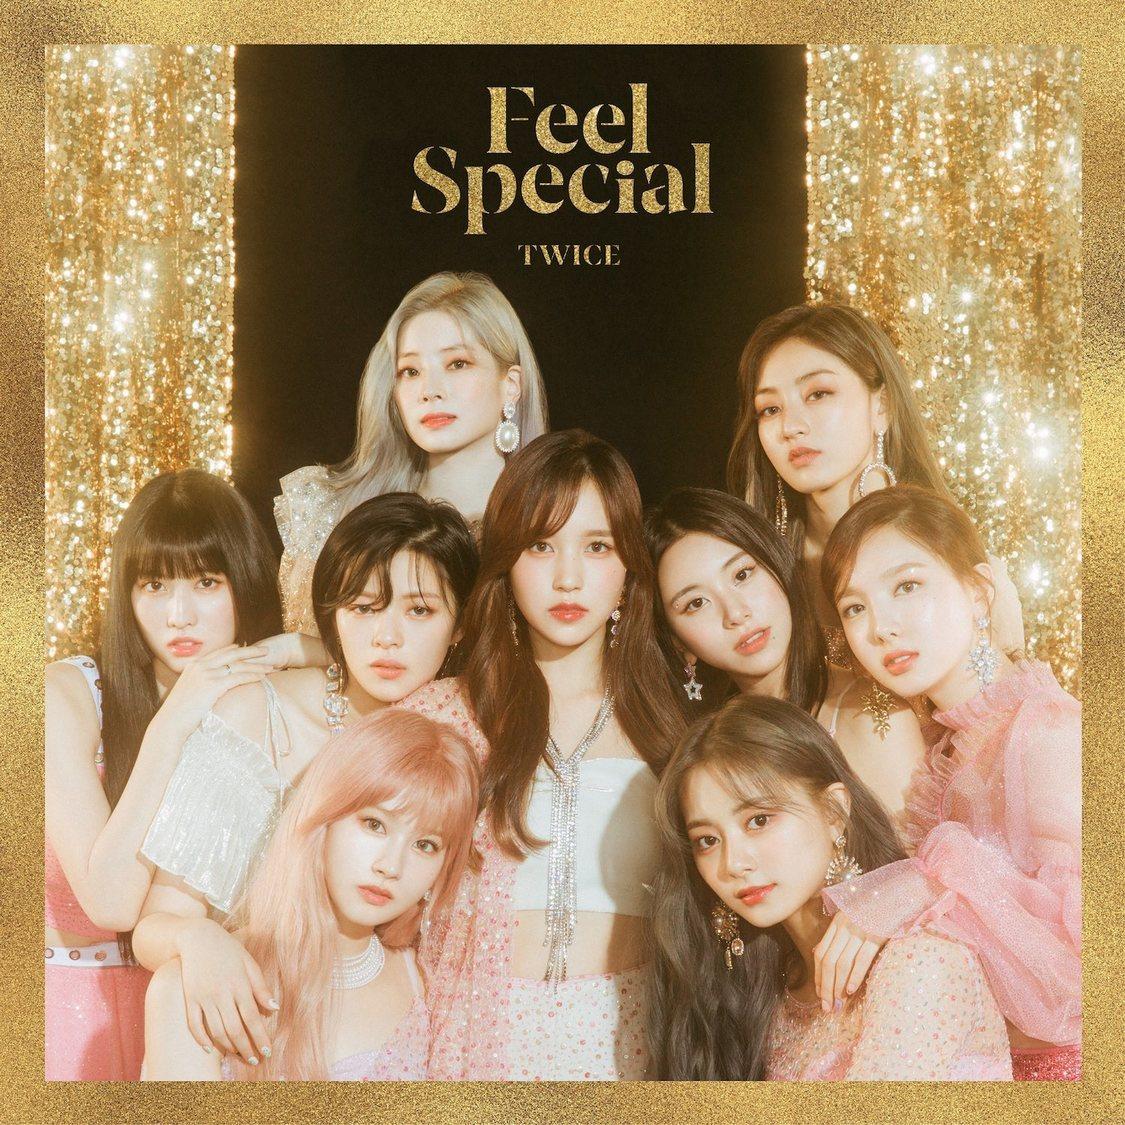 TWICE、「Feel Special」がレコ協ストリーミングプラチナ(1億回再生以上)認定に